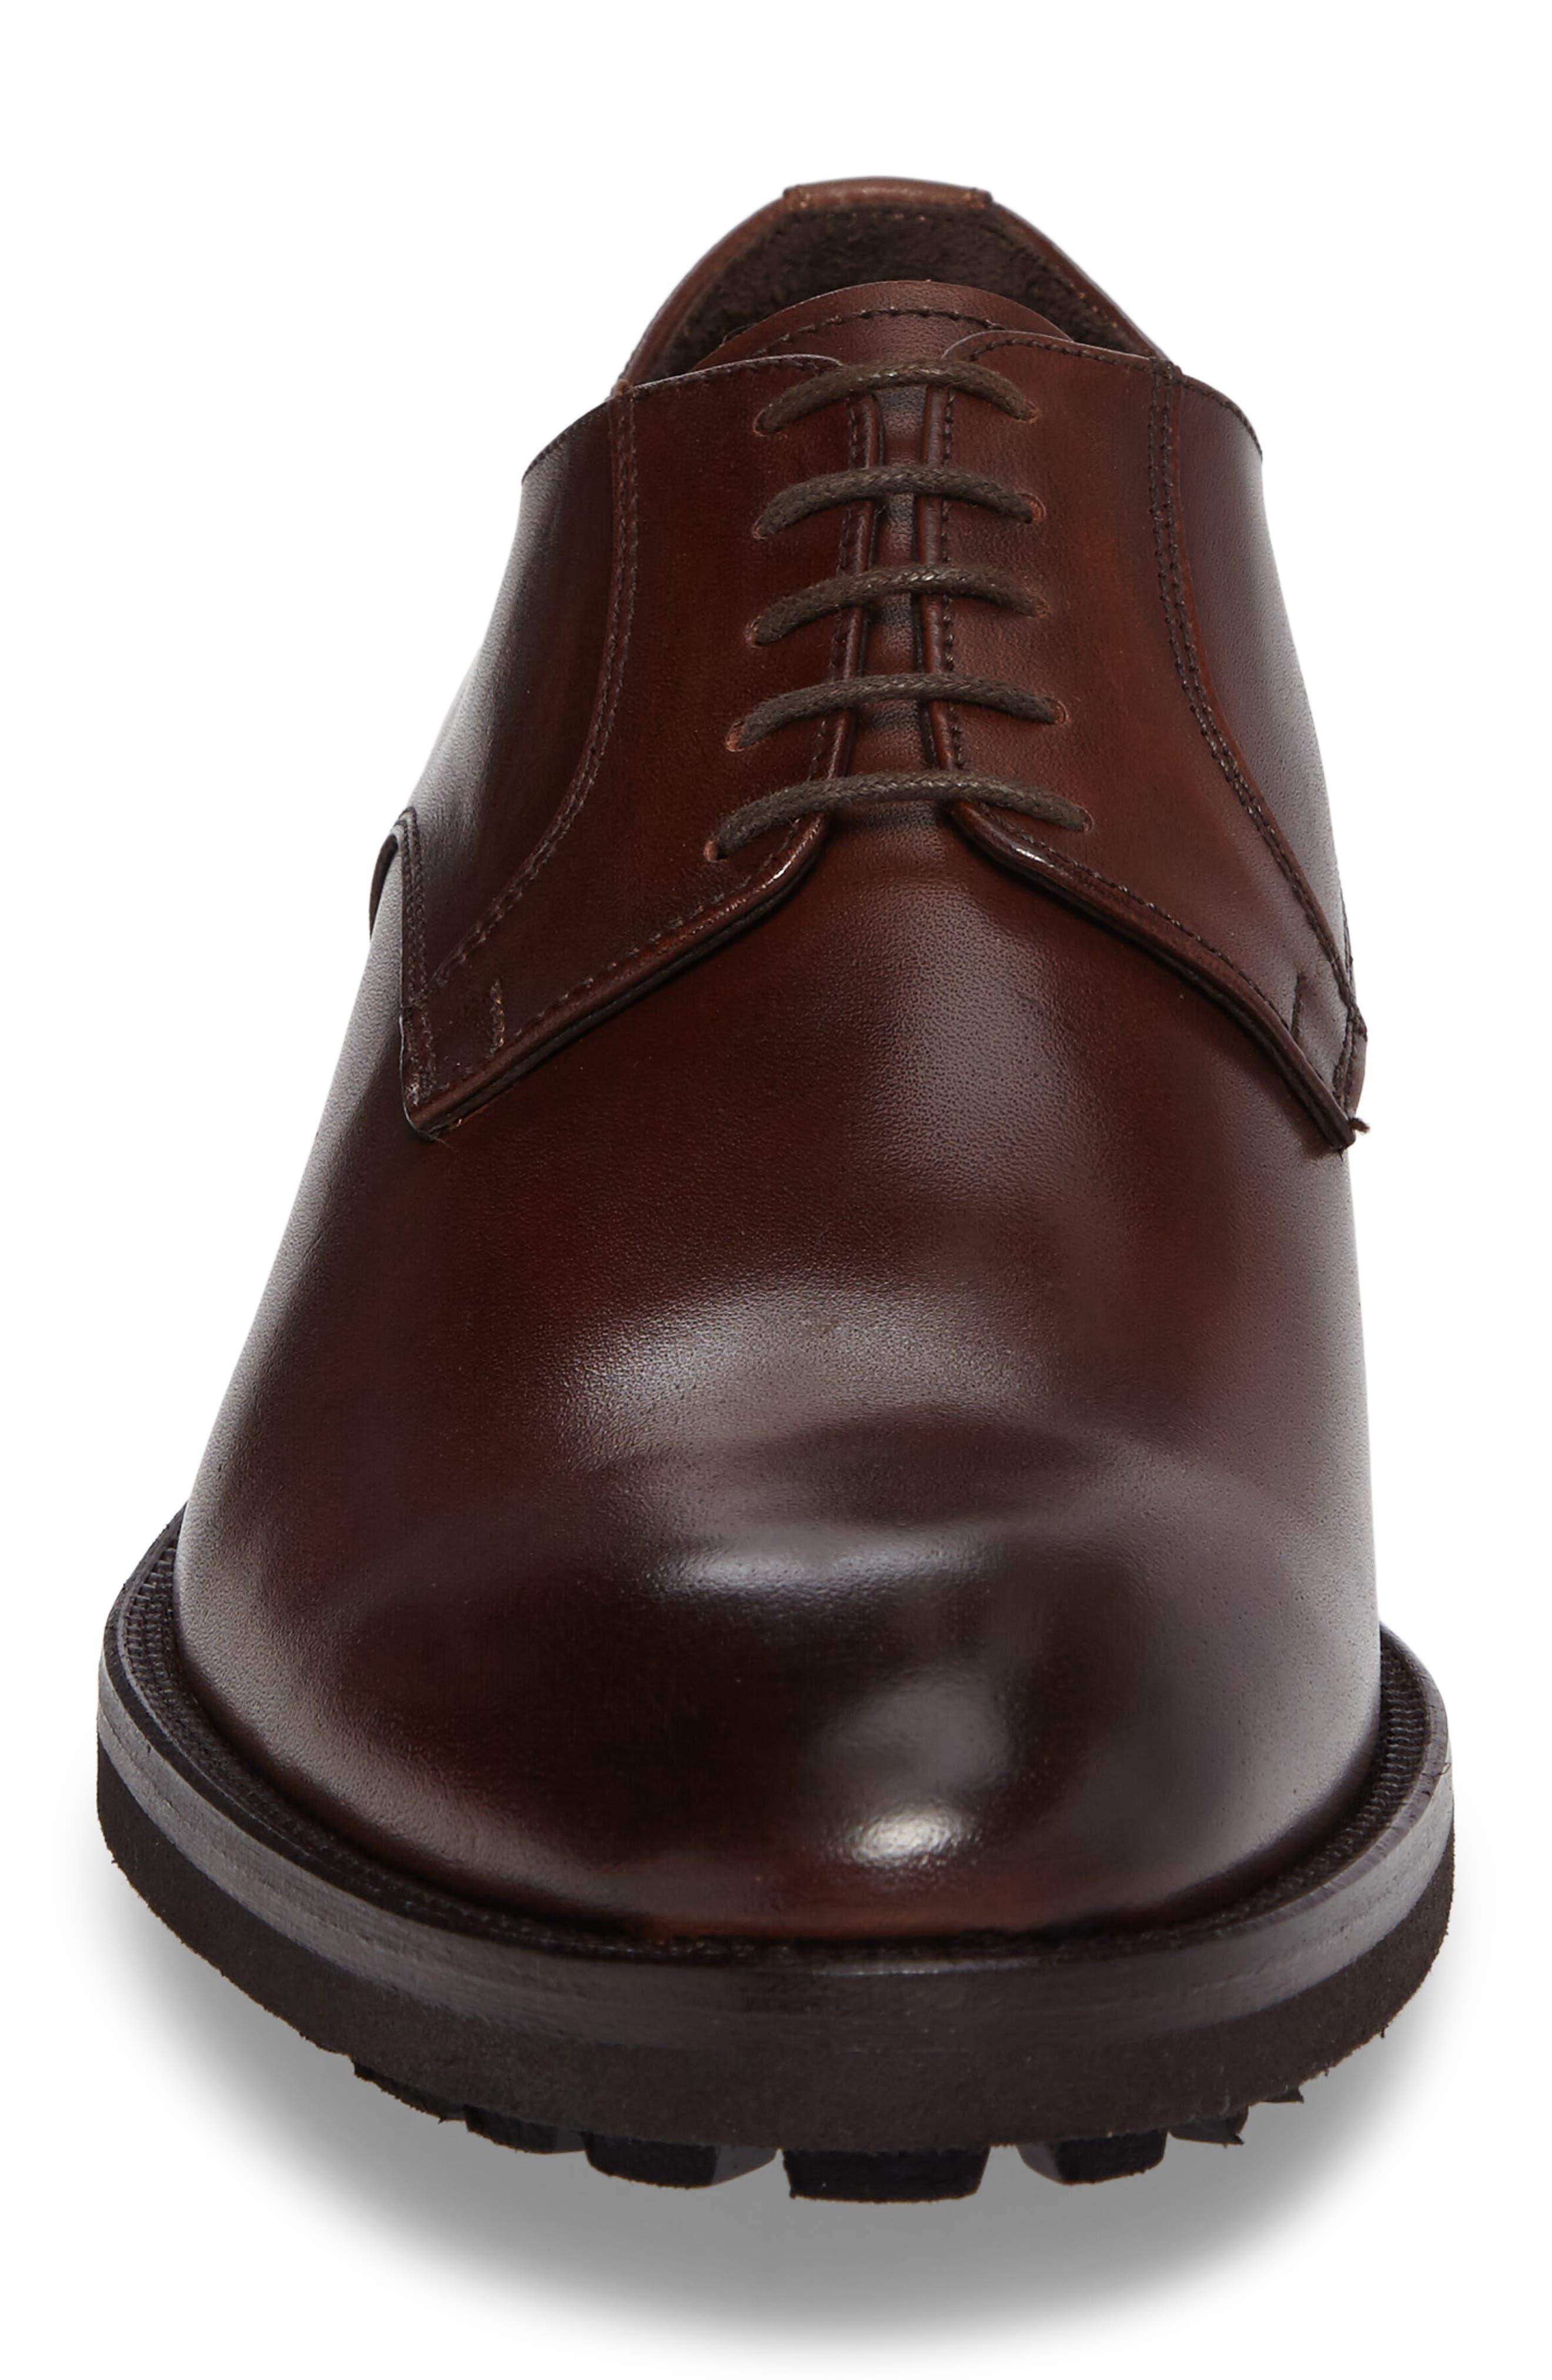 Martell Plain Toe Derby,                             Alternate thumbnail 4, color,                             Marrone